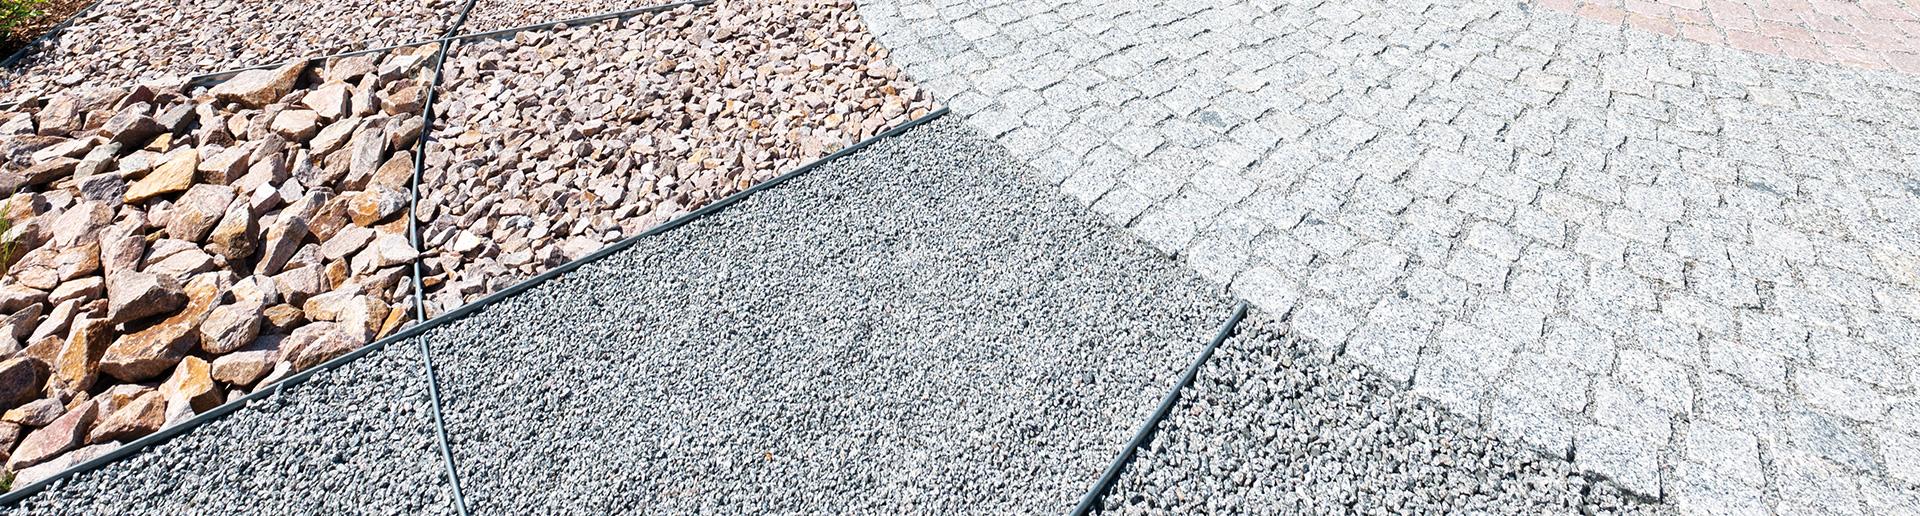 Gamme de pierres naturelles grises – RÖHRIGgranit